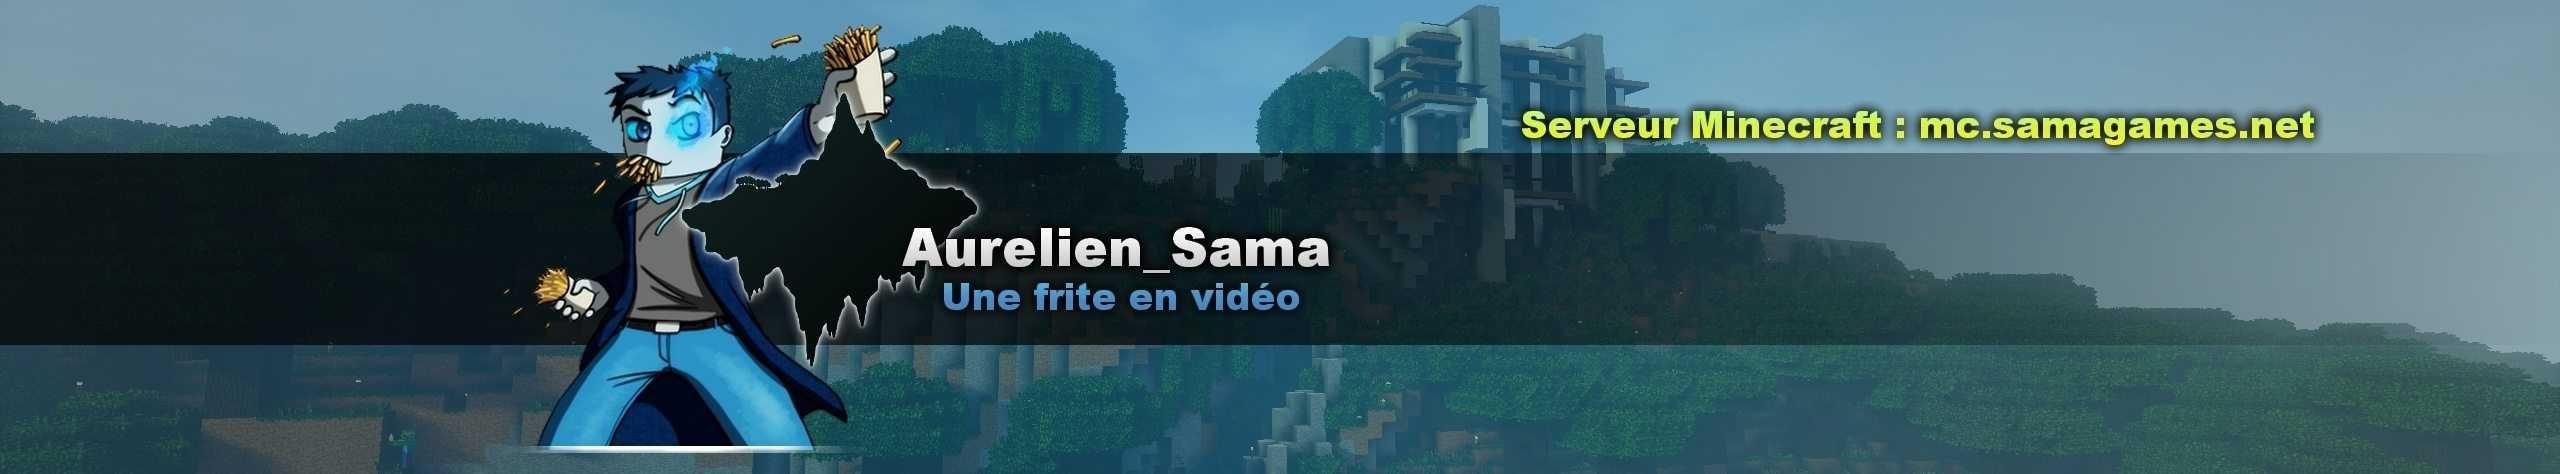 Aurélien_Sama